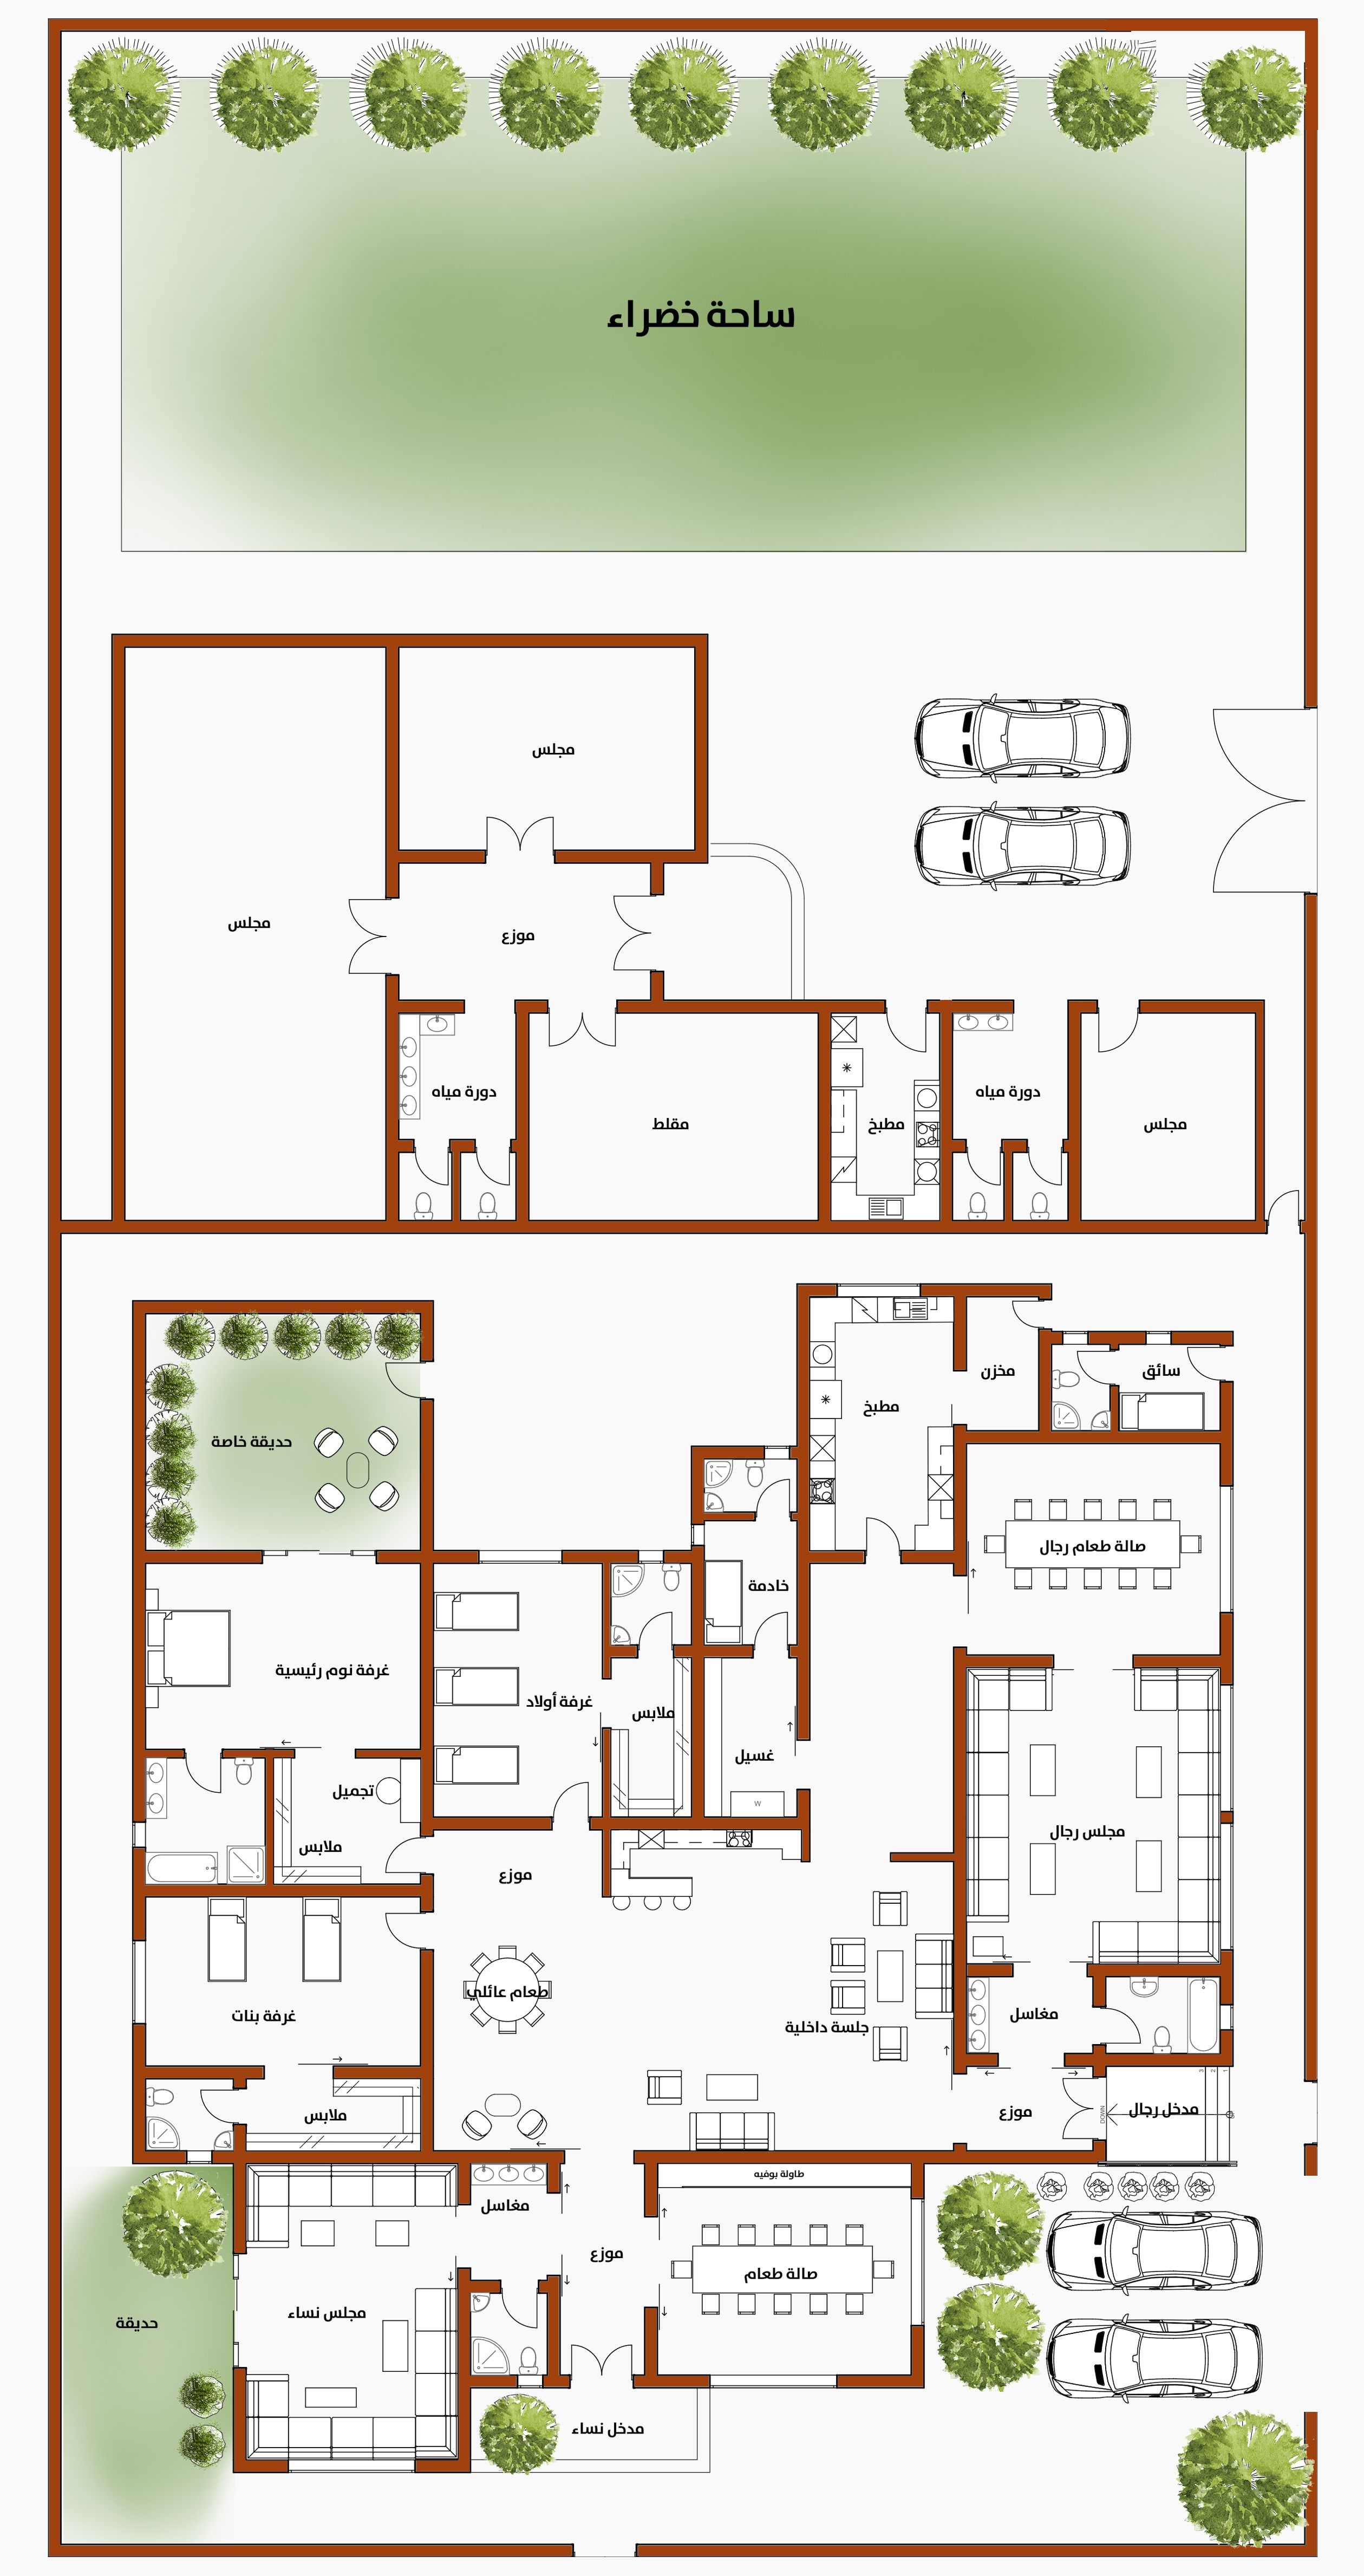 Architecture Plan House Modern Villa عمارة تصميم مخطط منزل Villa Plan House Plans How To Plan